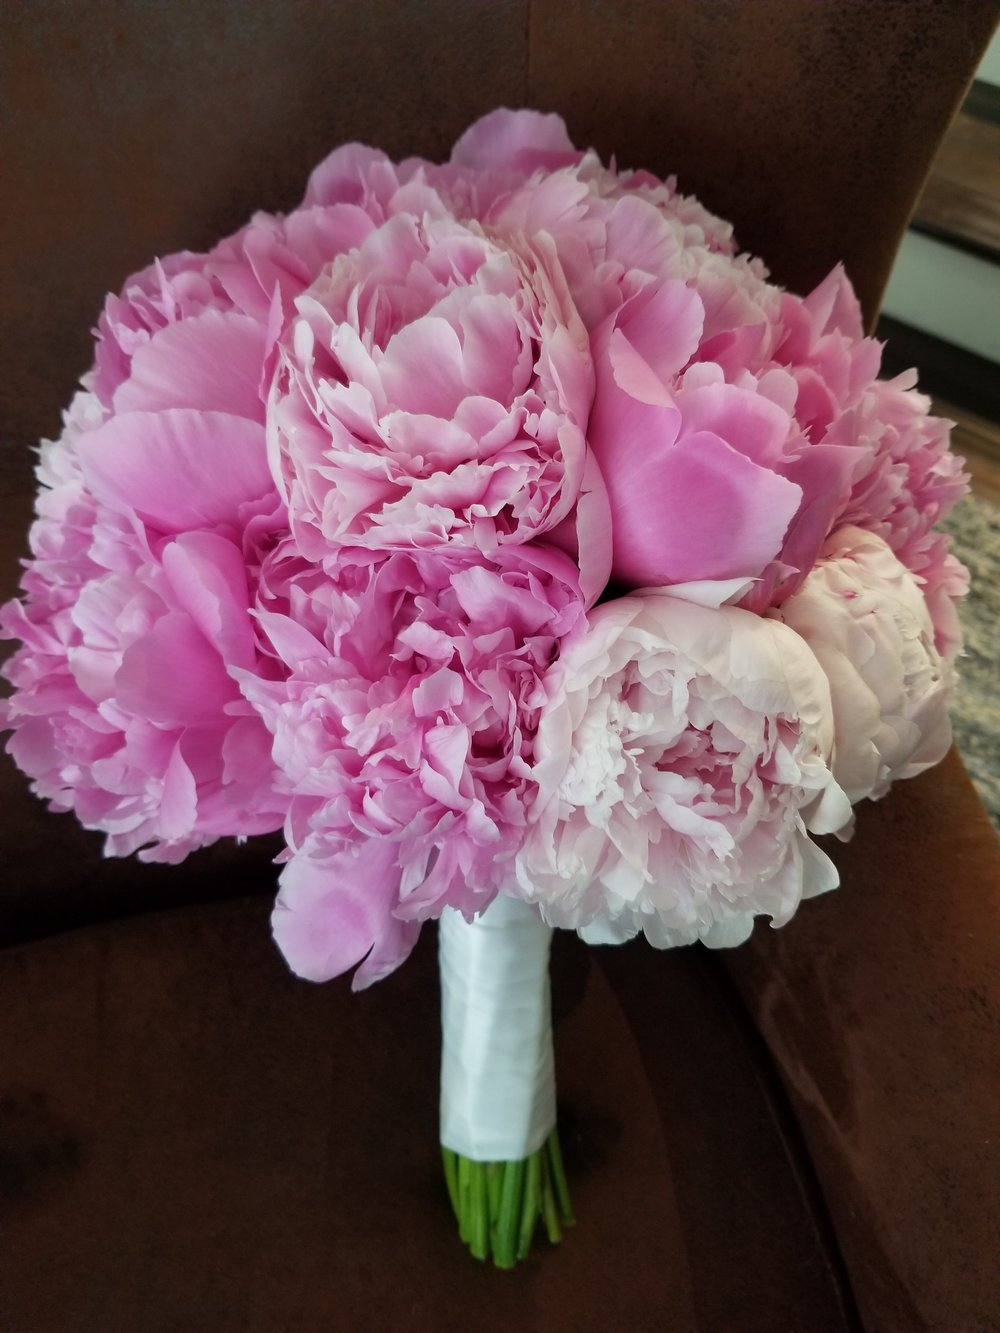 2018-06-02 Bouquet pink peony2.jpg